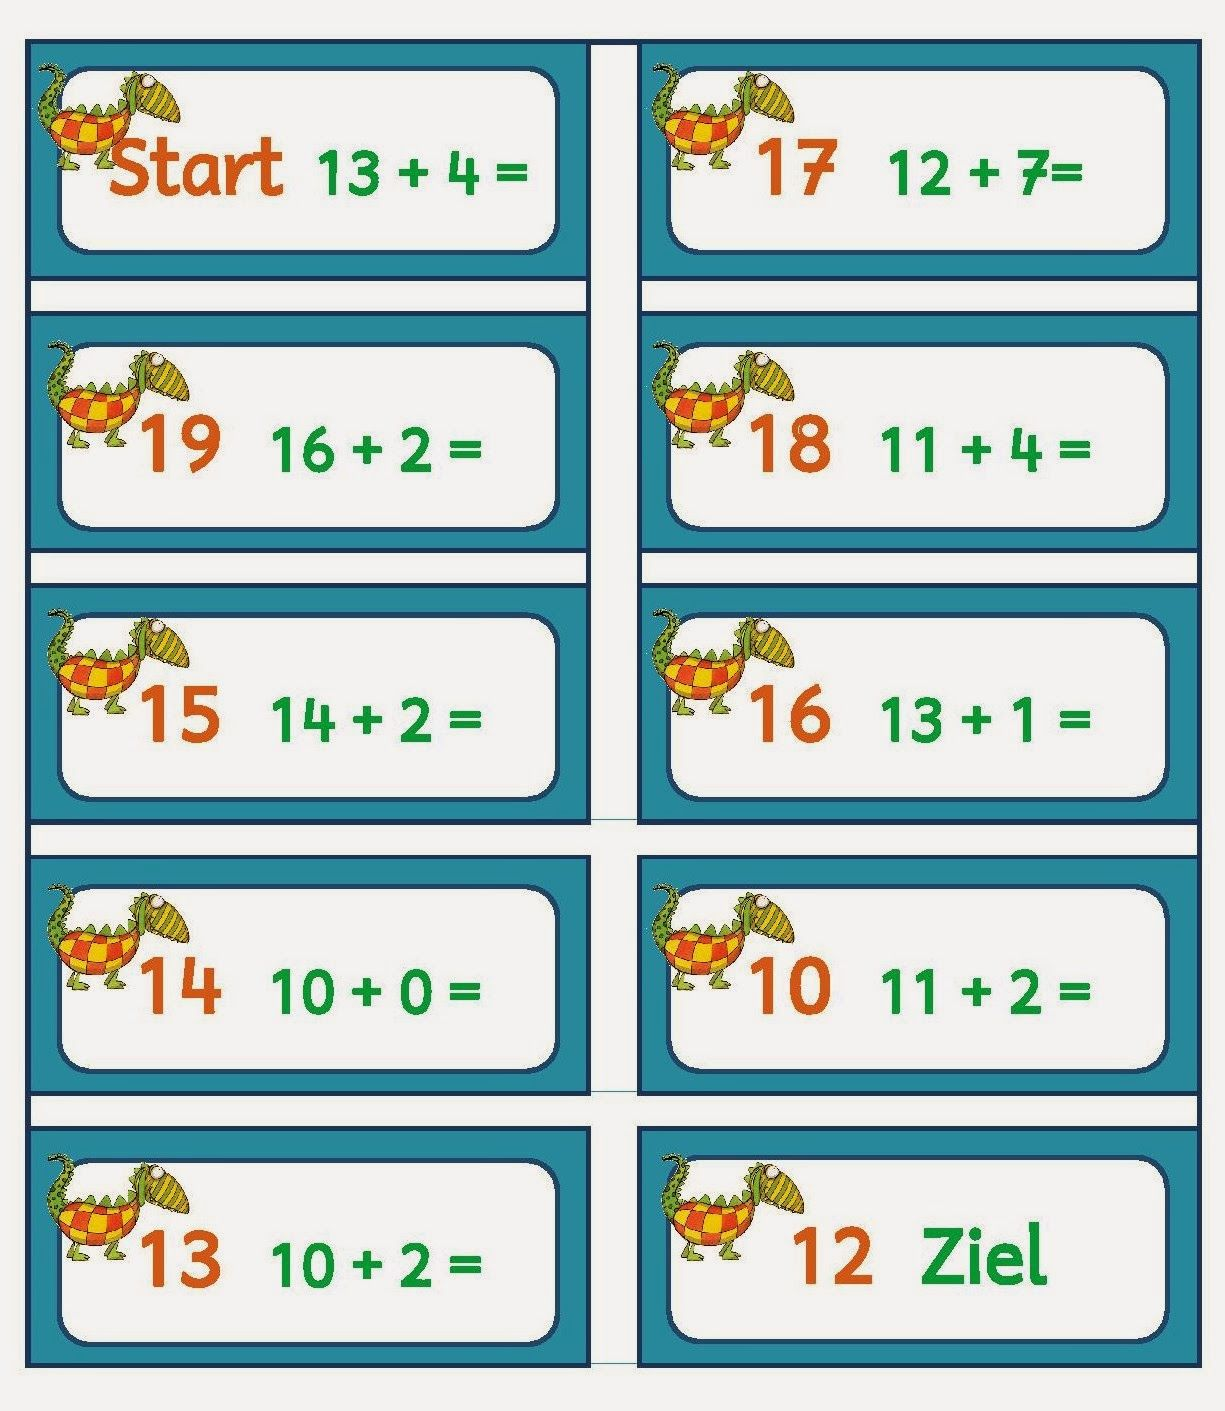 Mompitz Rechendomino bis 20   Mathe, Mathe unterrichten ...